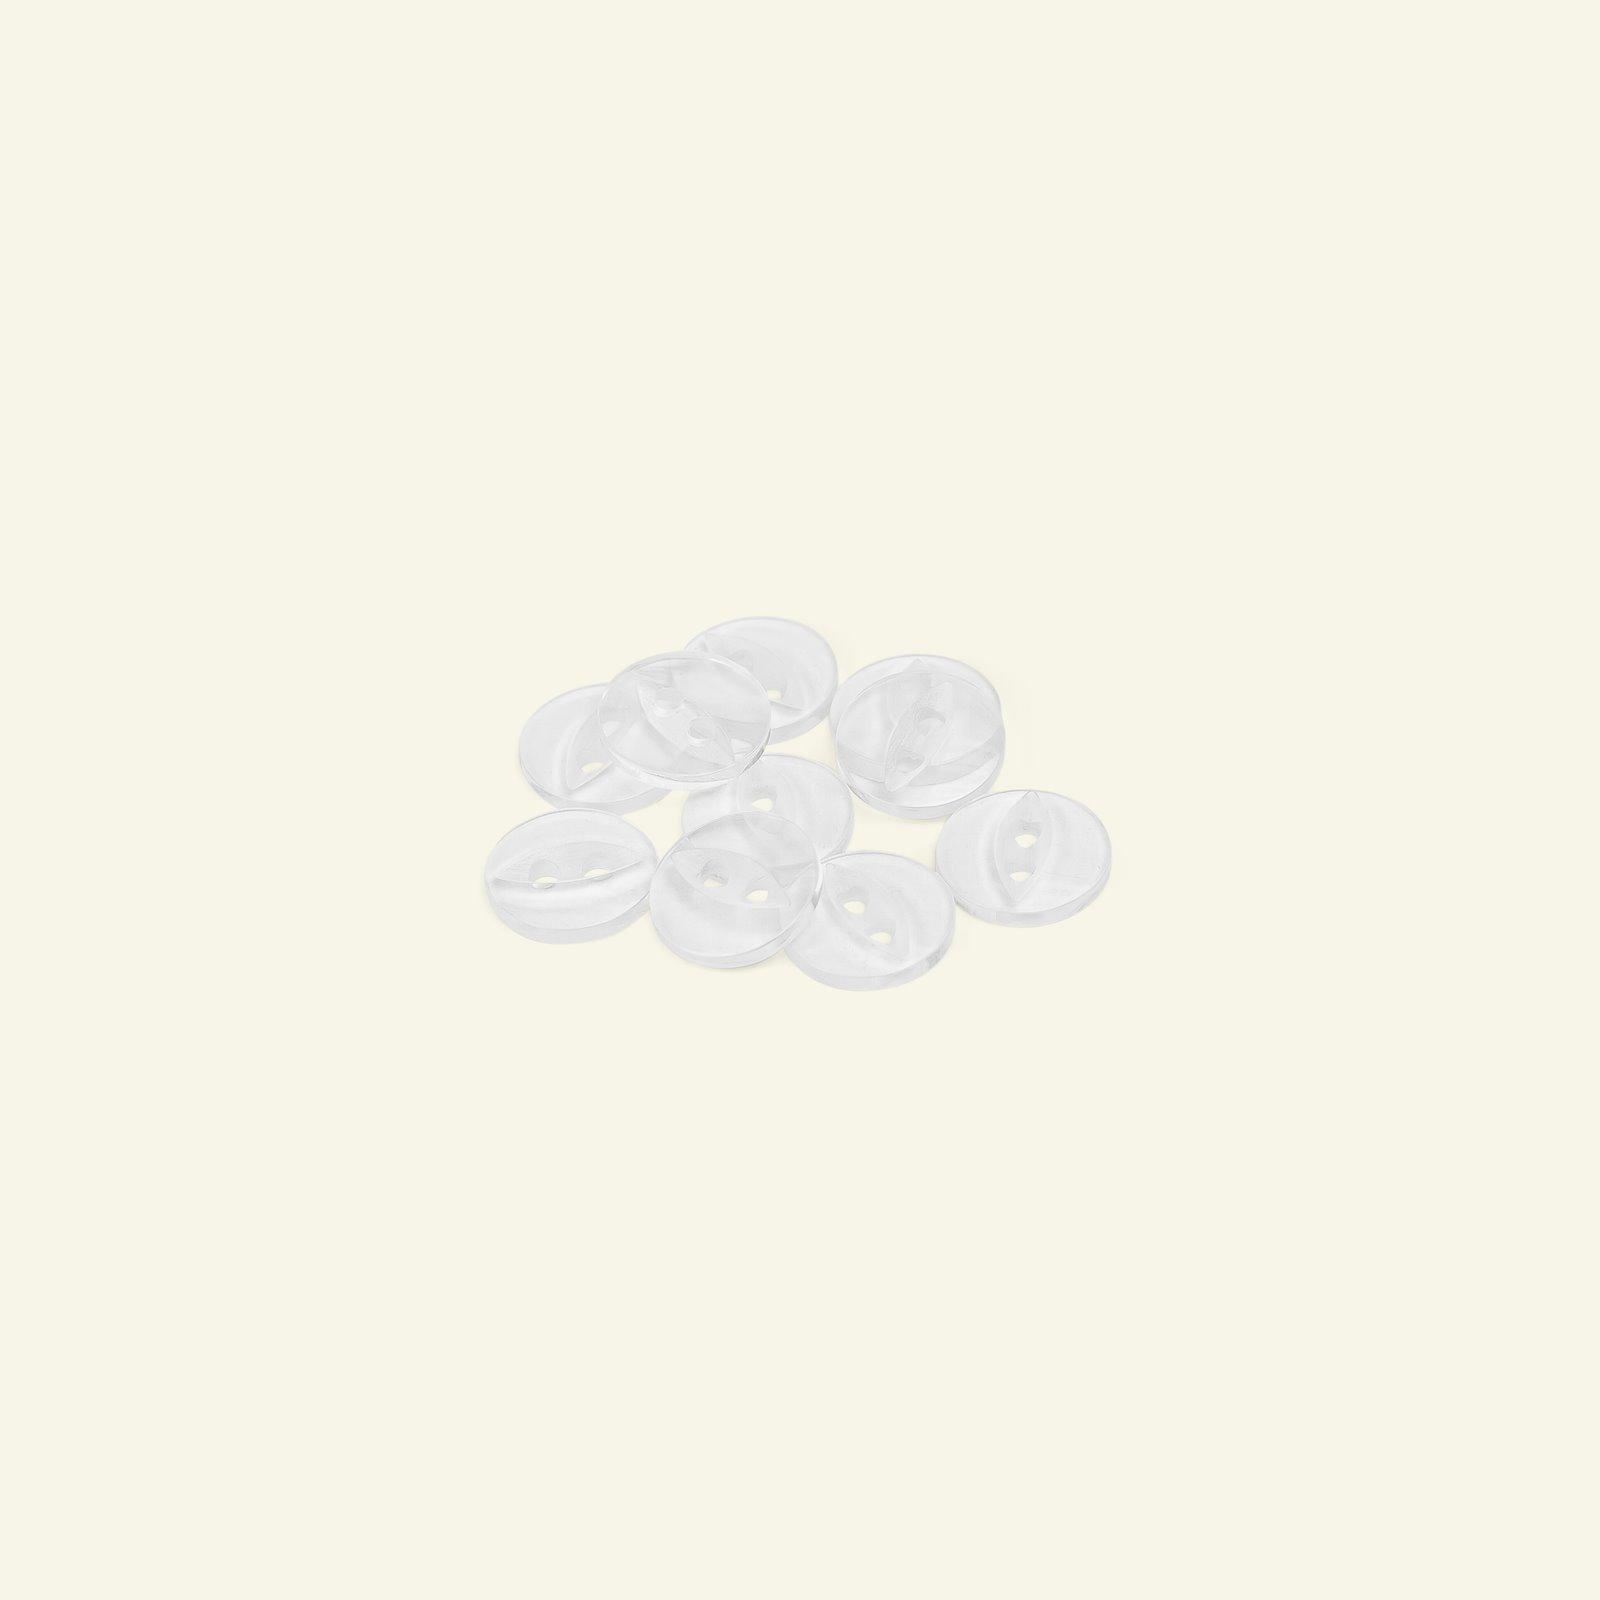 Button 2-holes 12mm clear 10pcs 33005_pack